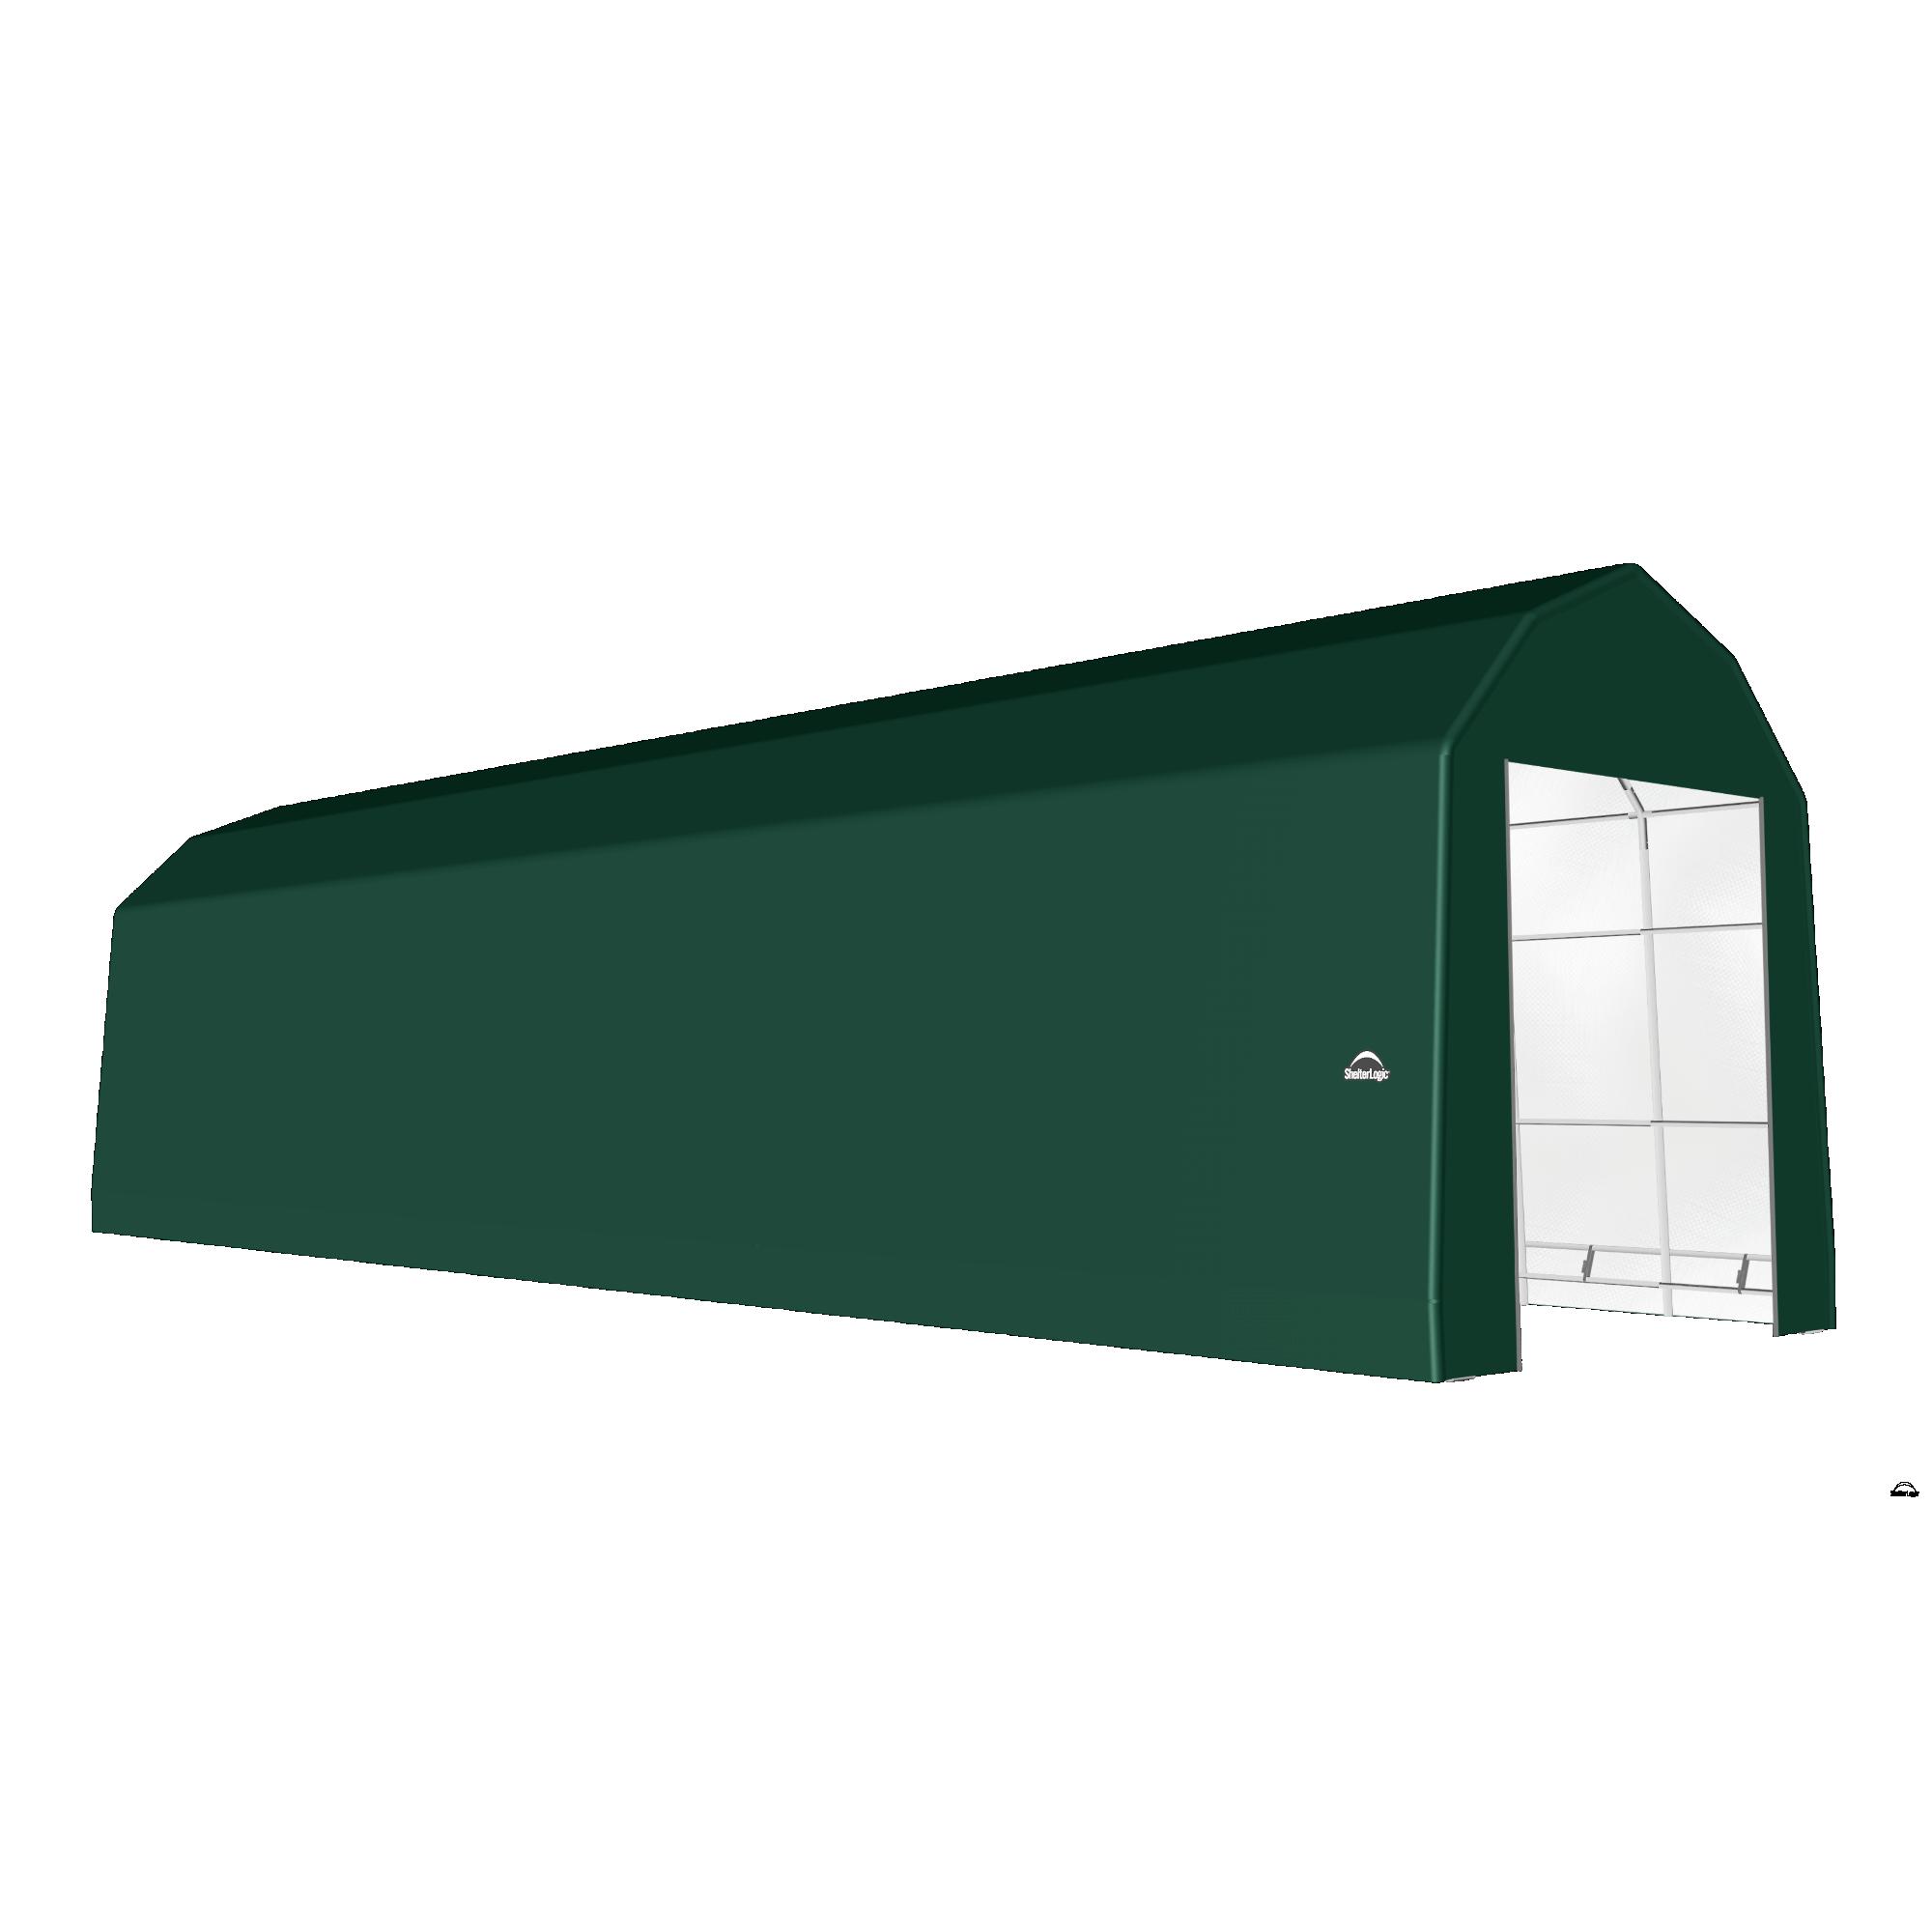 SP Barn 15X52X17 Green 14 oz PE Shelter